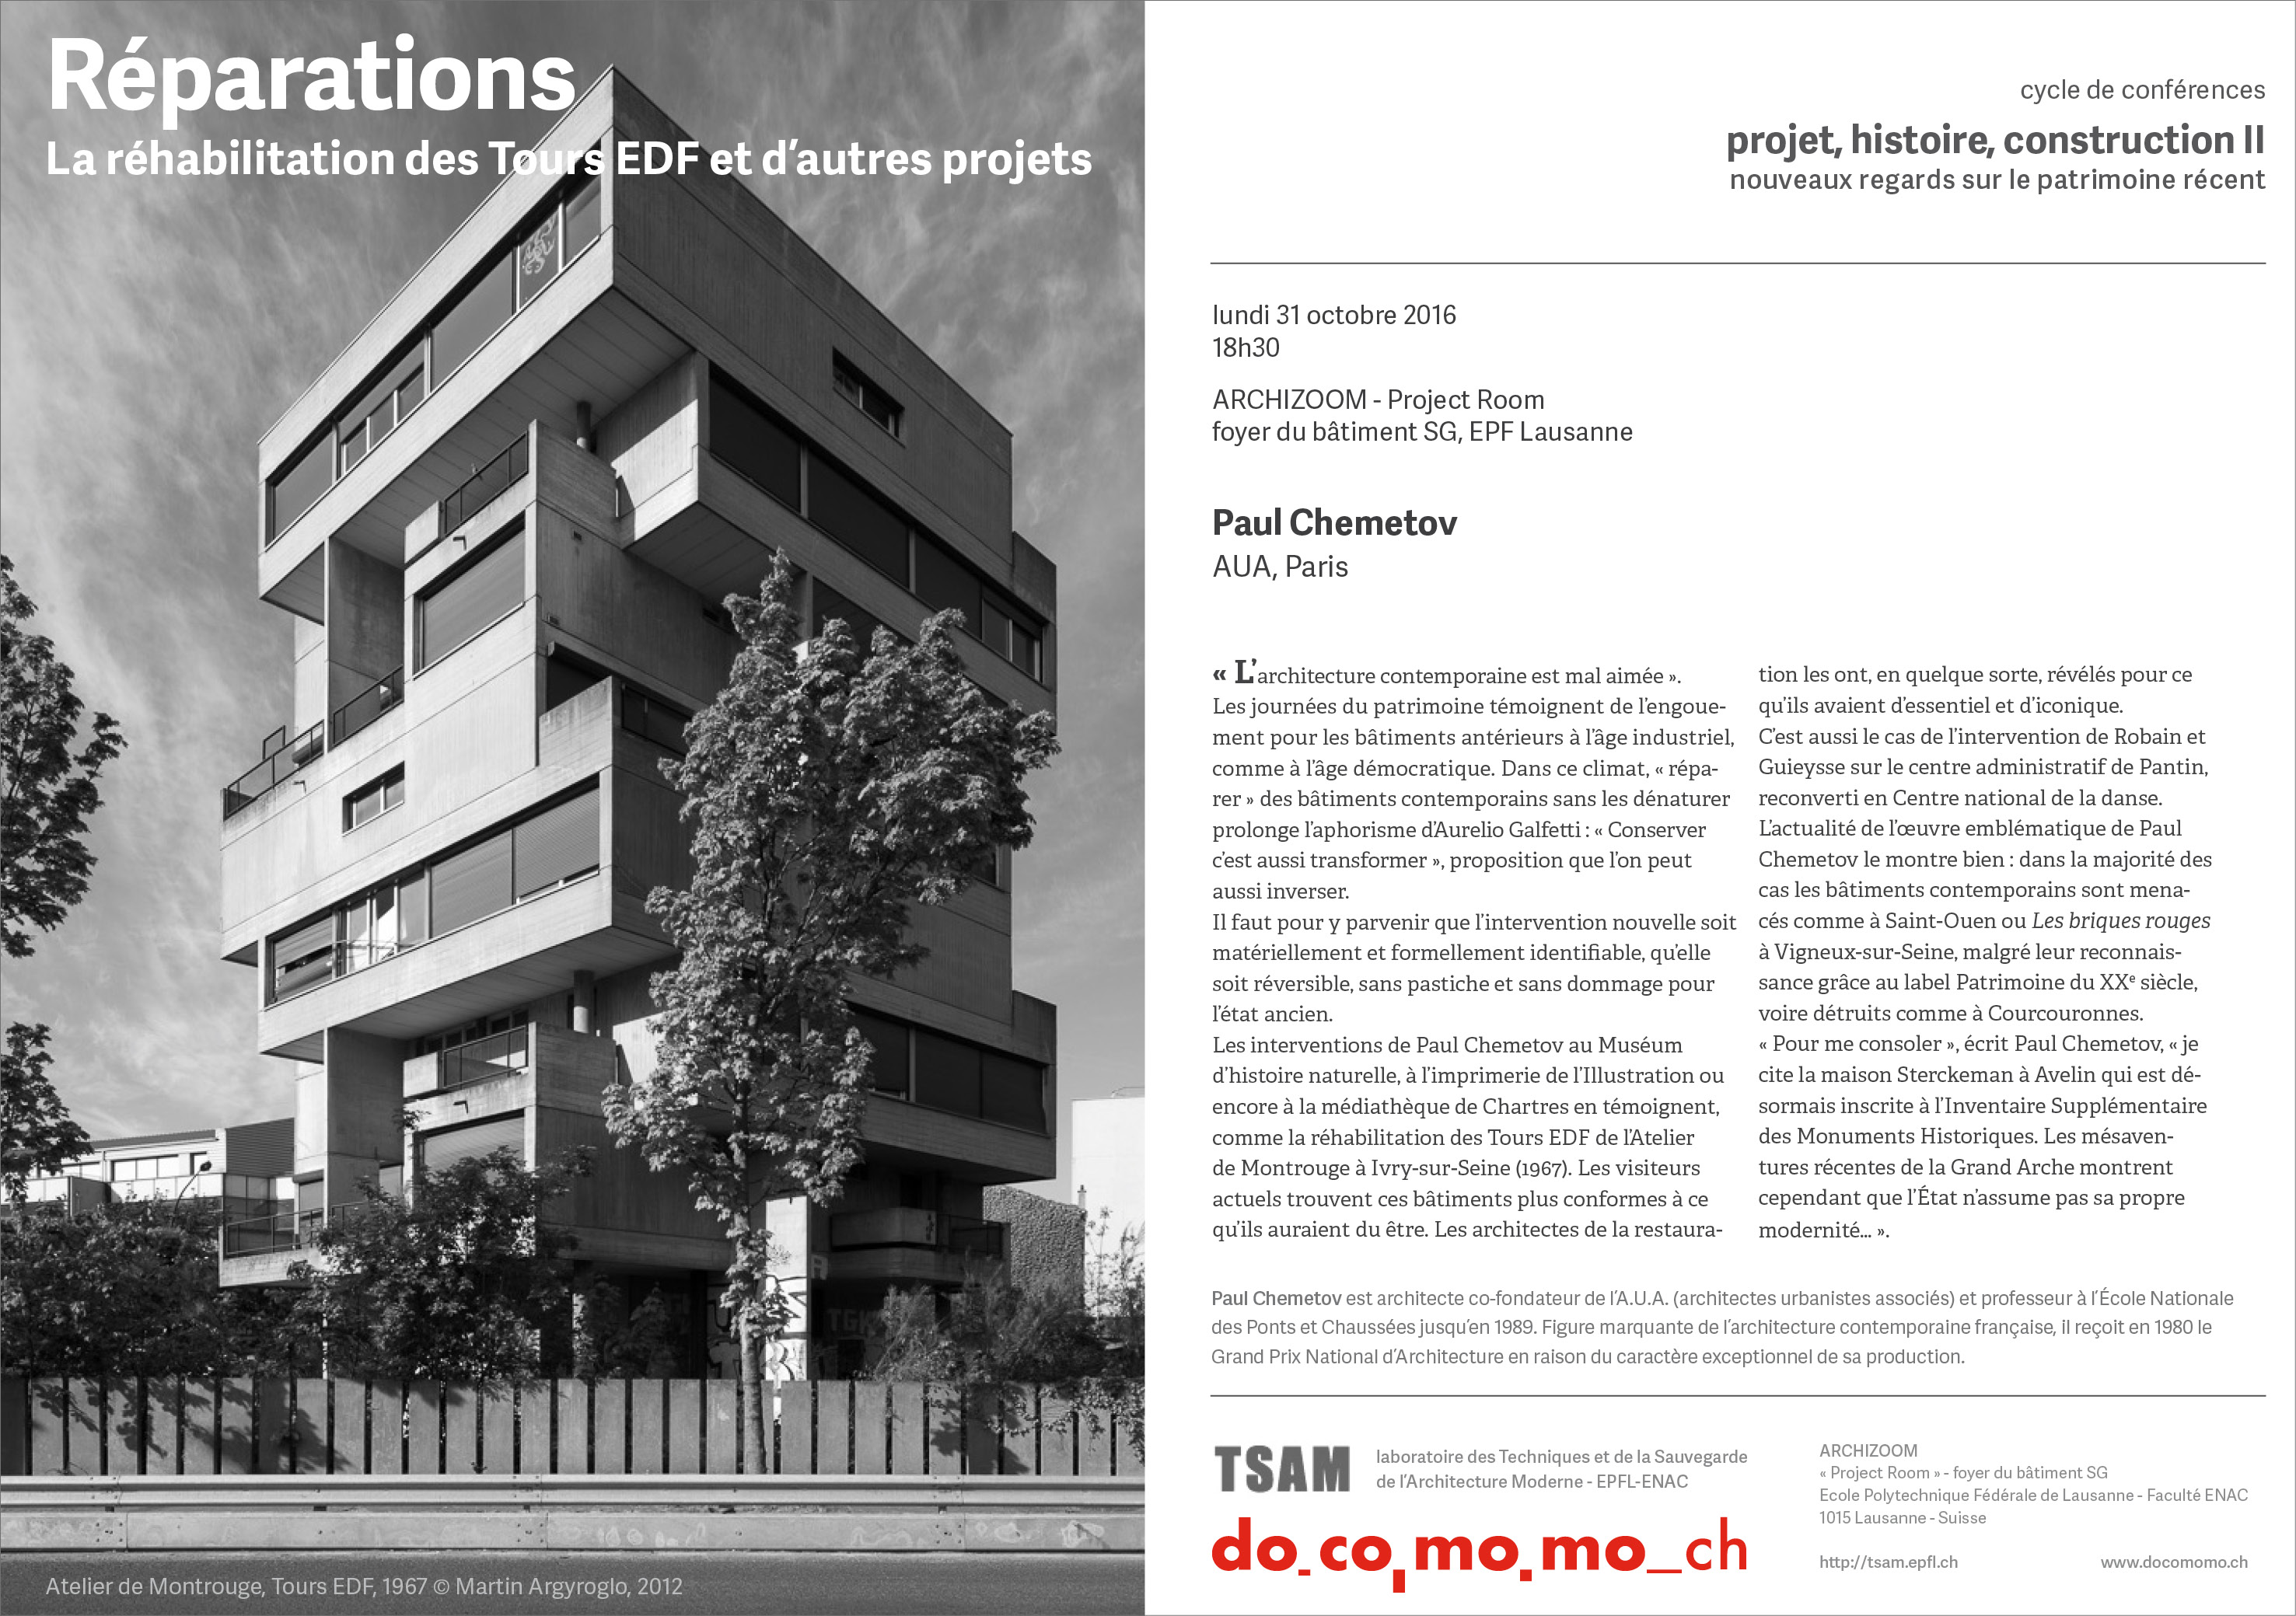 docomomo switzerland TSAM-EPFL Paul Chemetov Atelier de Montrouge